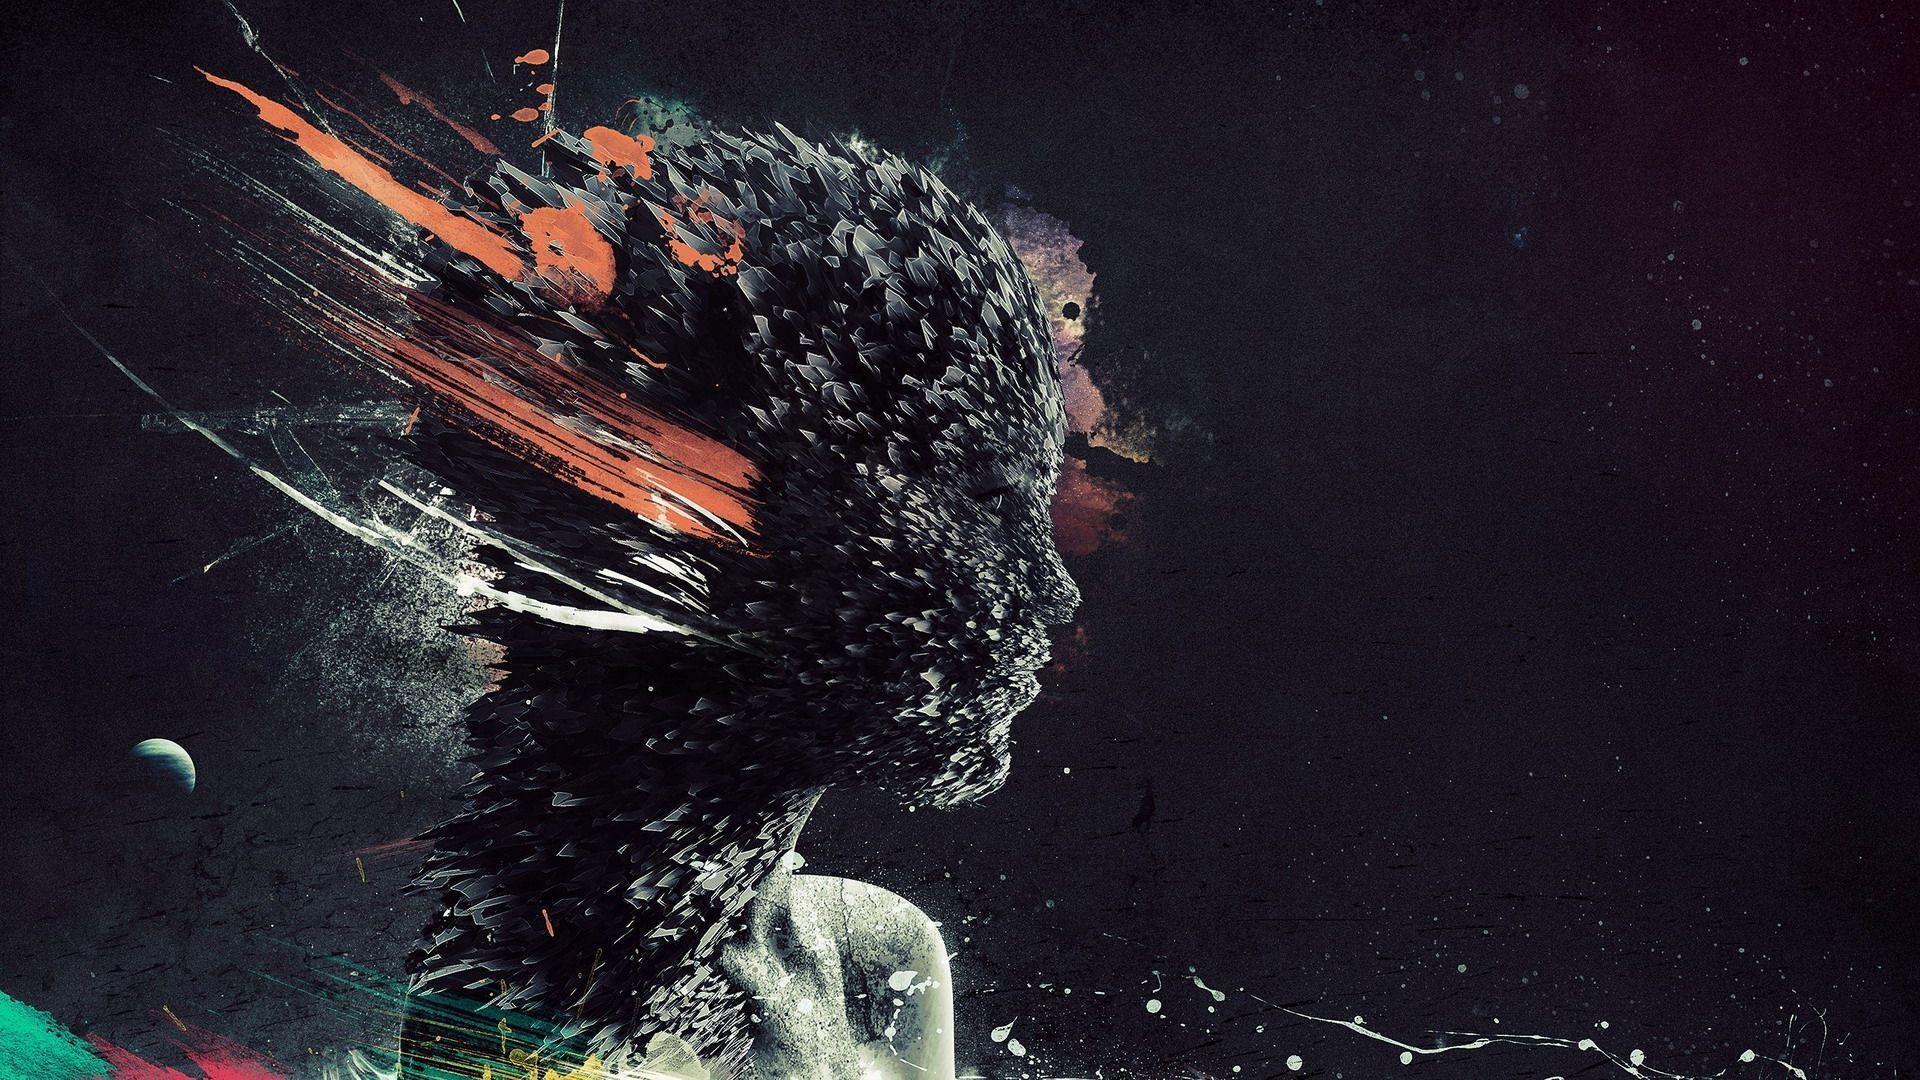 abstract brain wallpaper mind - photo #33